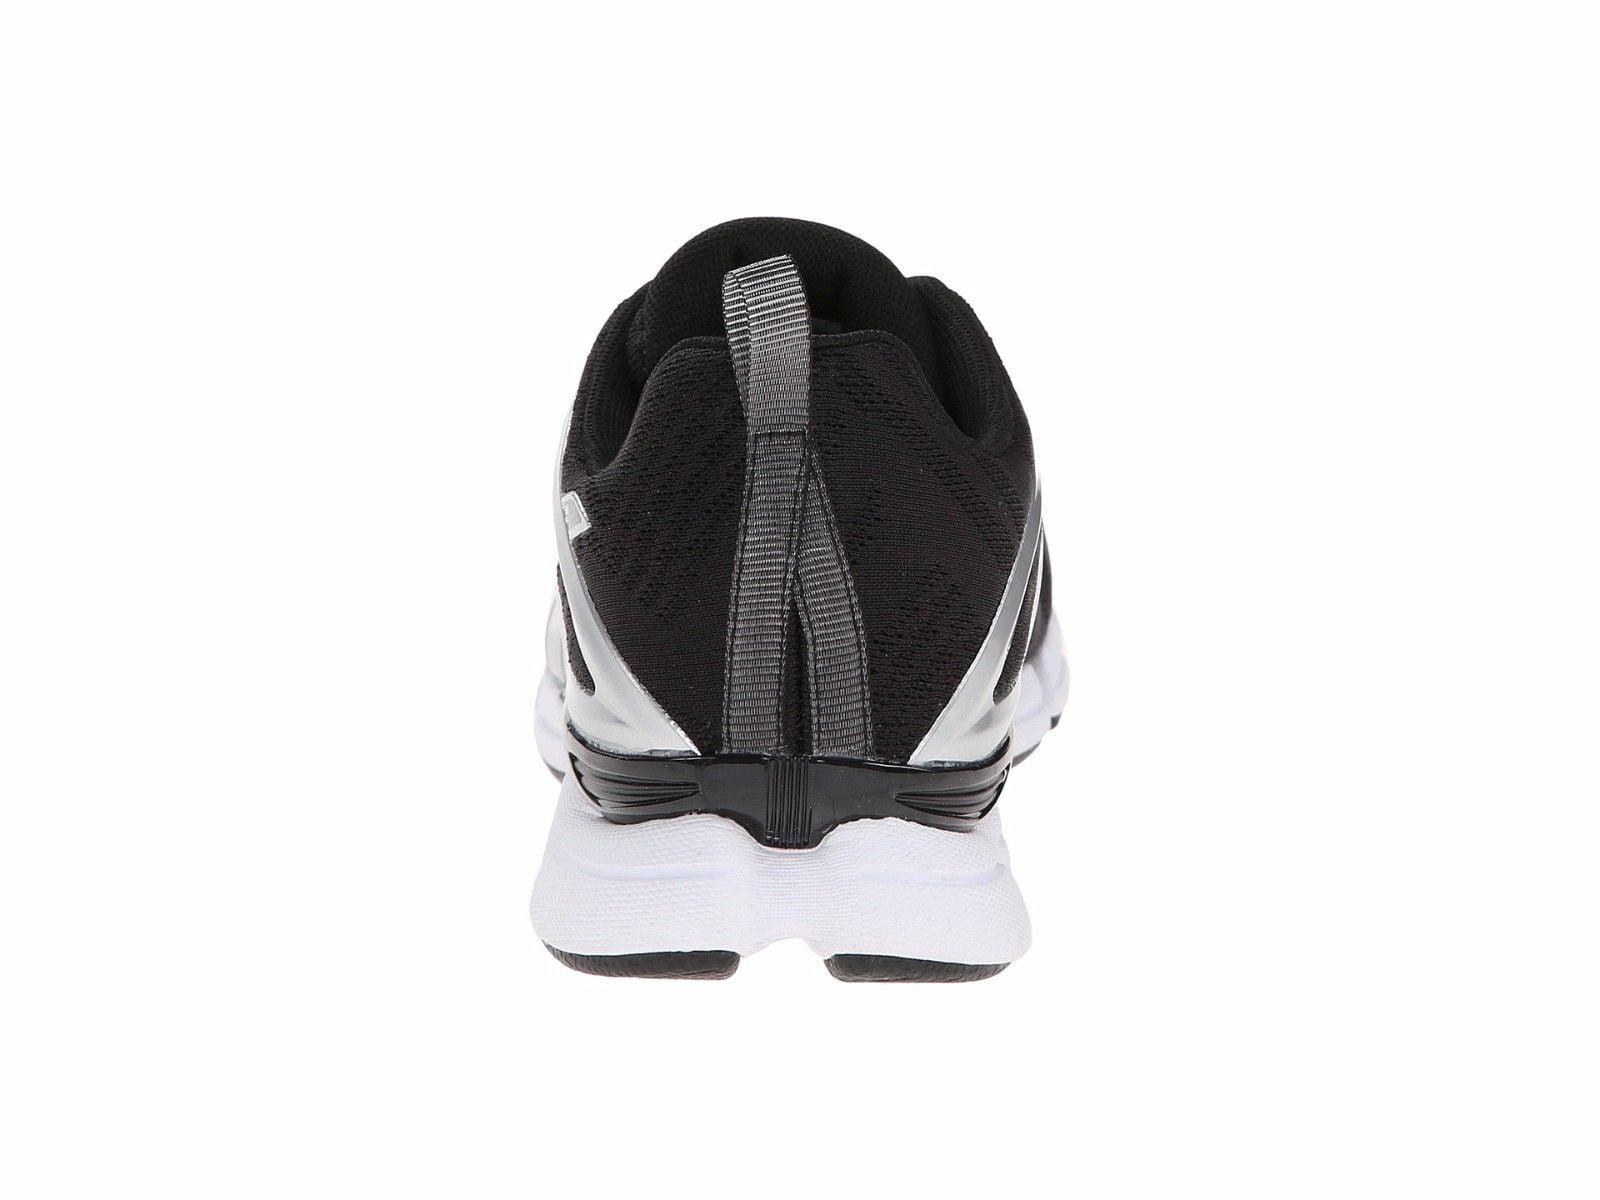 PUMA Women's Formlite S HY Casual Sneakers